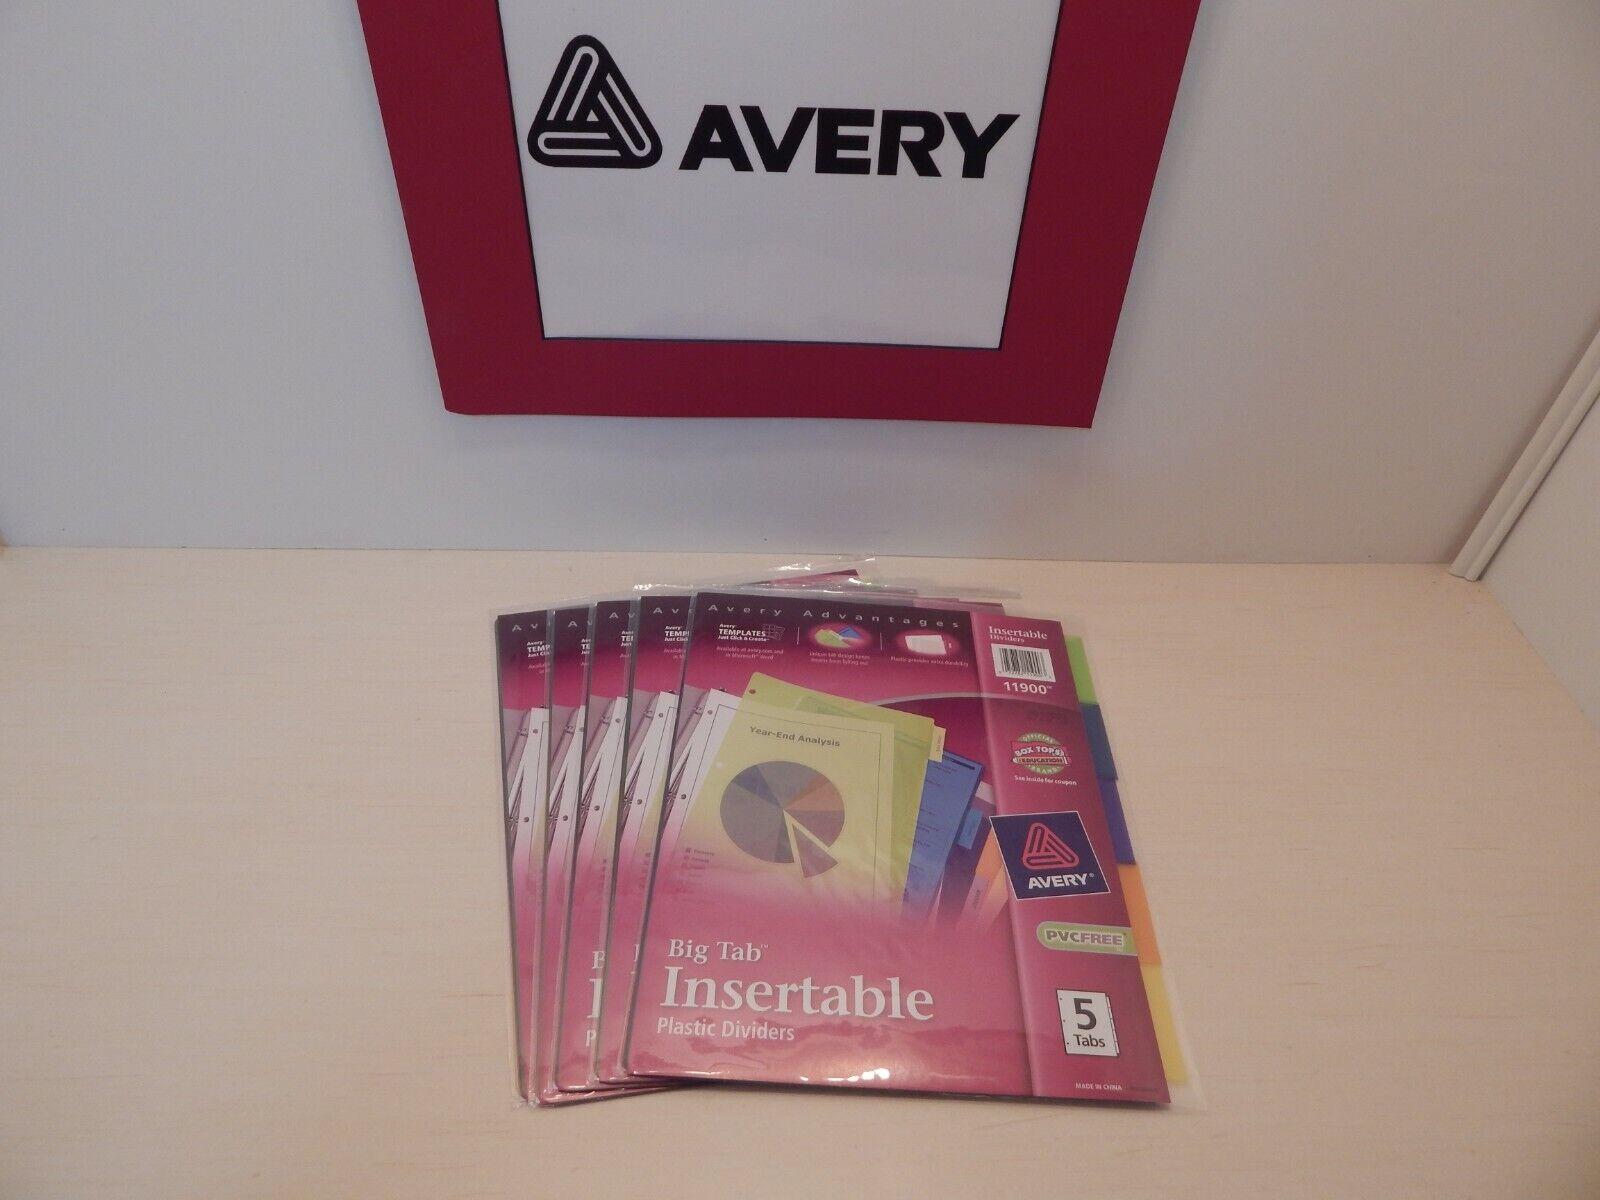 Avery Advantages BIG TAB Insertable 5 Tab Plastic Dividers